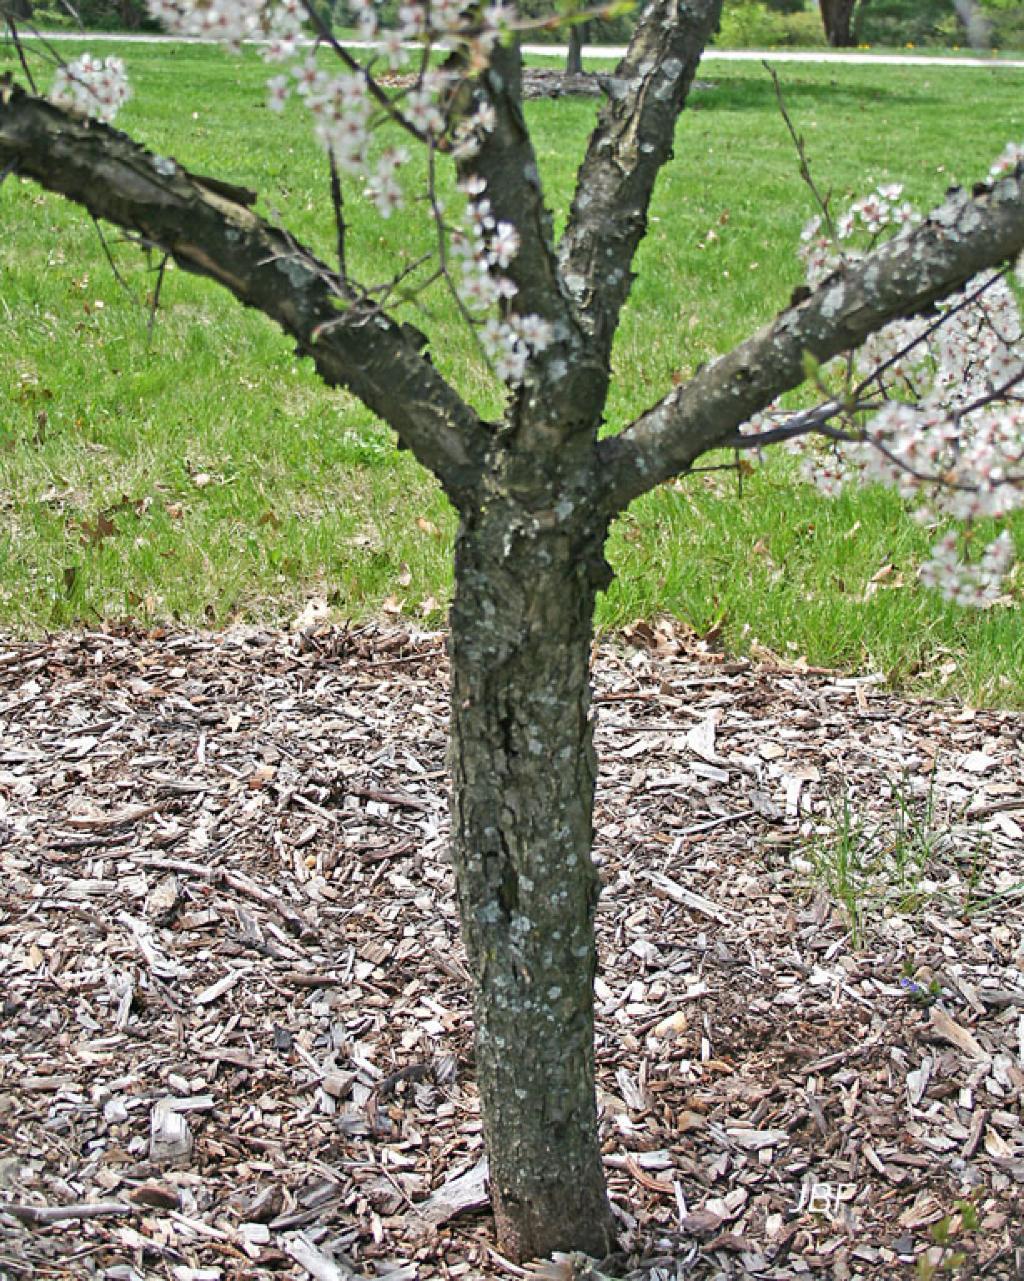 Prunus americana var. lanata (Sudw.) Mack. & Bush (wild plum), bark